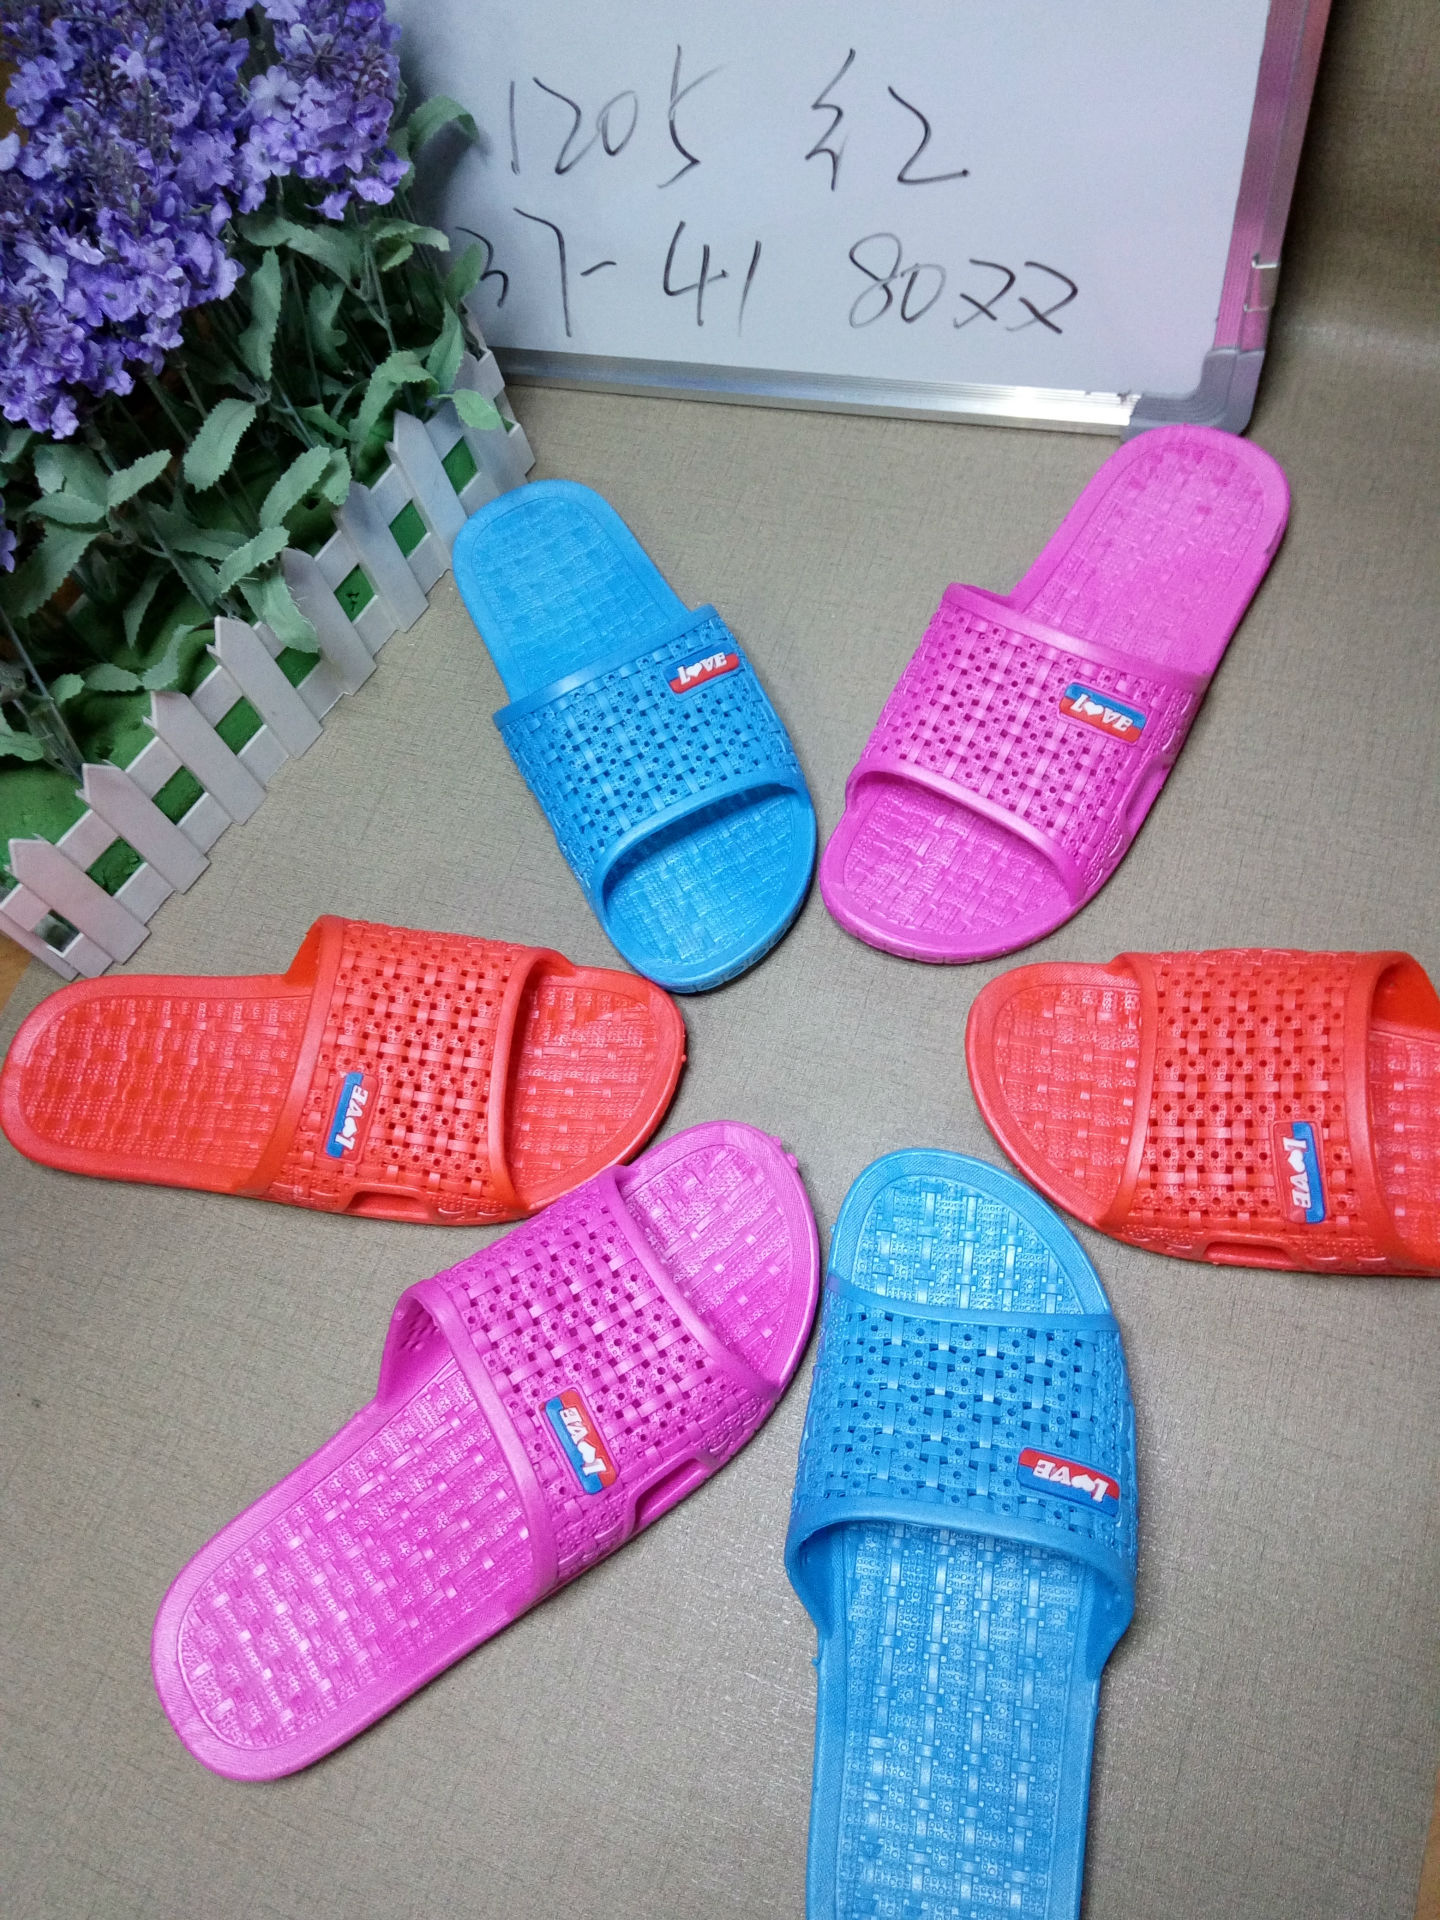 Hàng chính hãng giá gốc  The new Ms. summer home slippers multicolor genuine cheap inflatable bottom